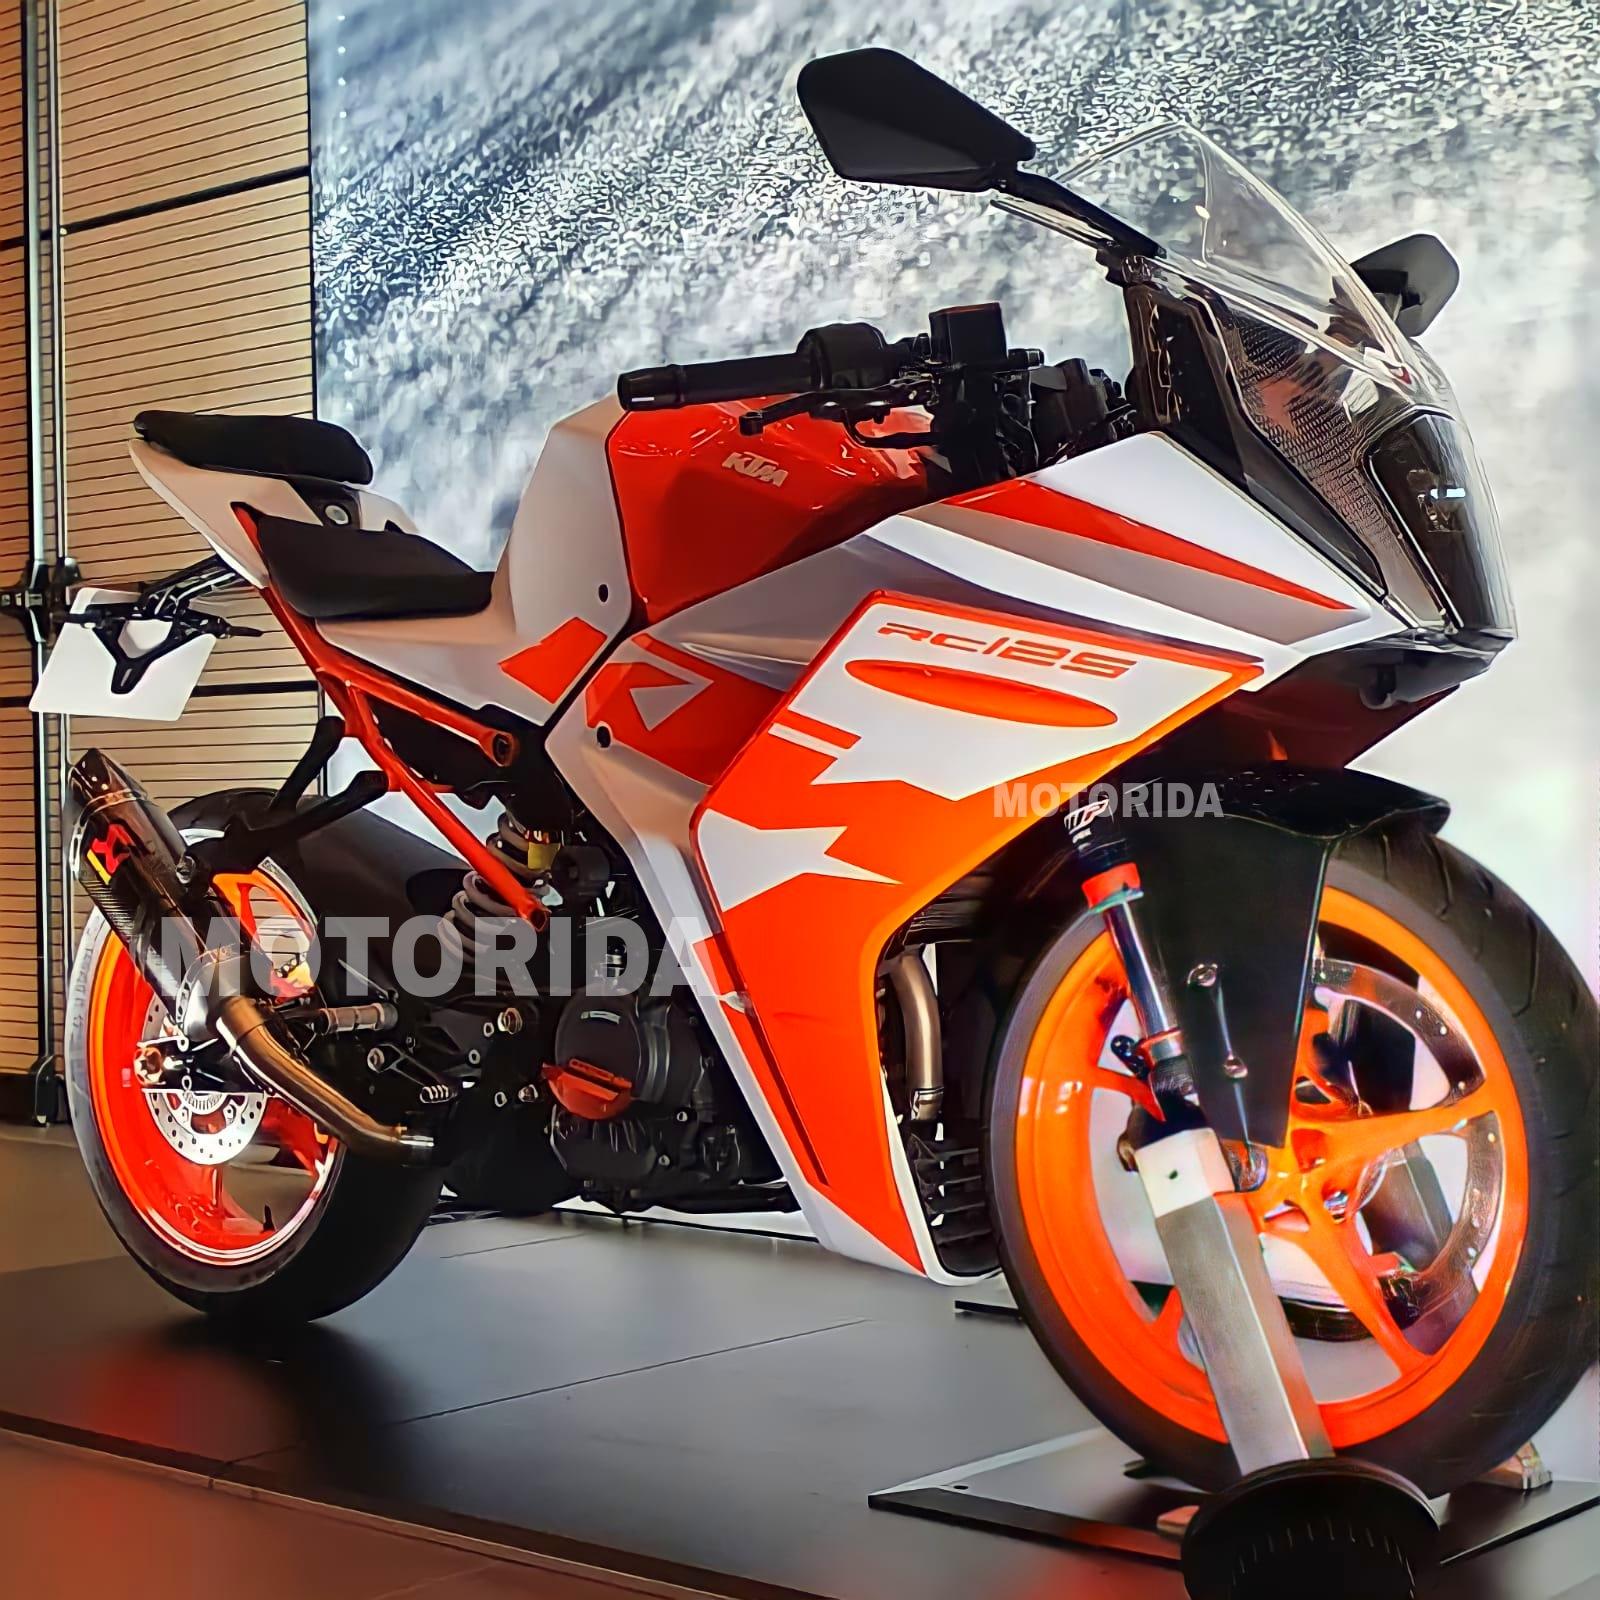 2022 KTM RC125, KTM RC125, New KTM RC125, KTM RC125, 2022 KTM RC 125 First look leaked. 2022 KTM RC 125 leaked images, 2022 KTM RC 125 First look,